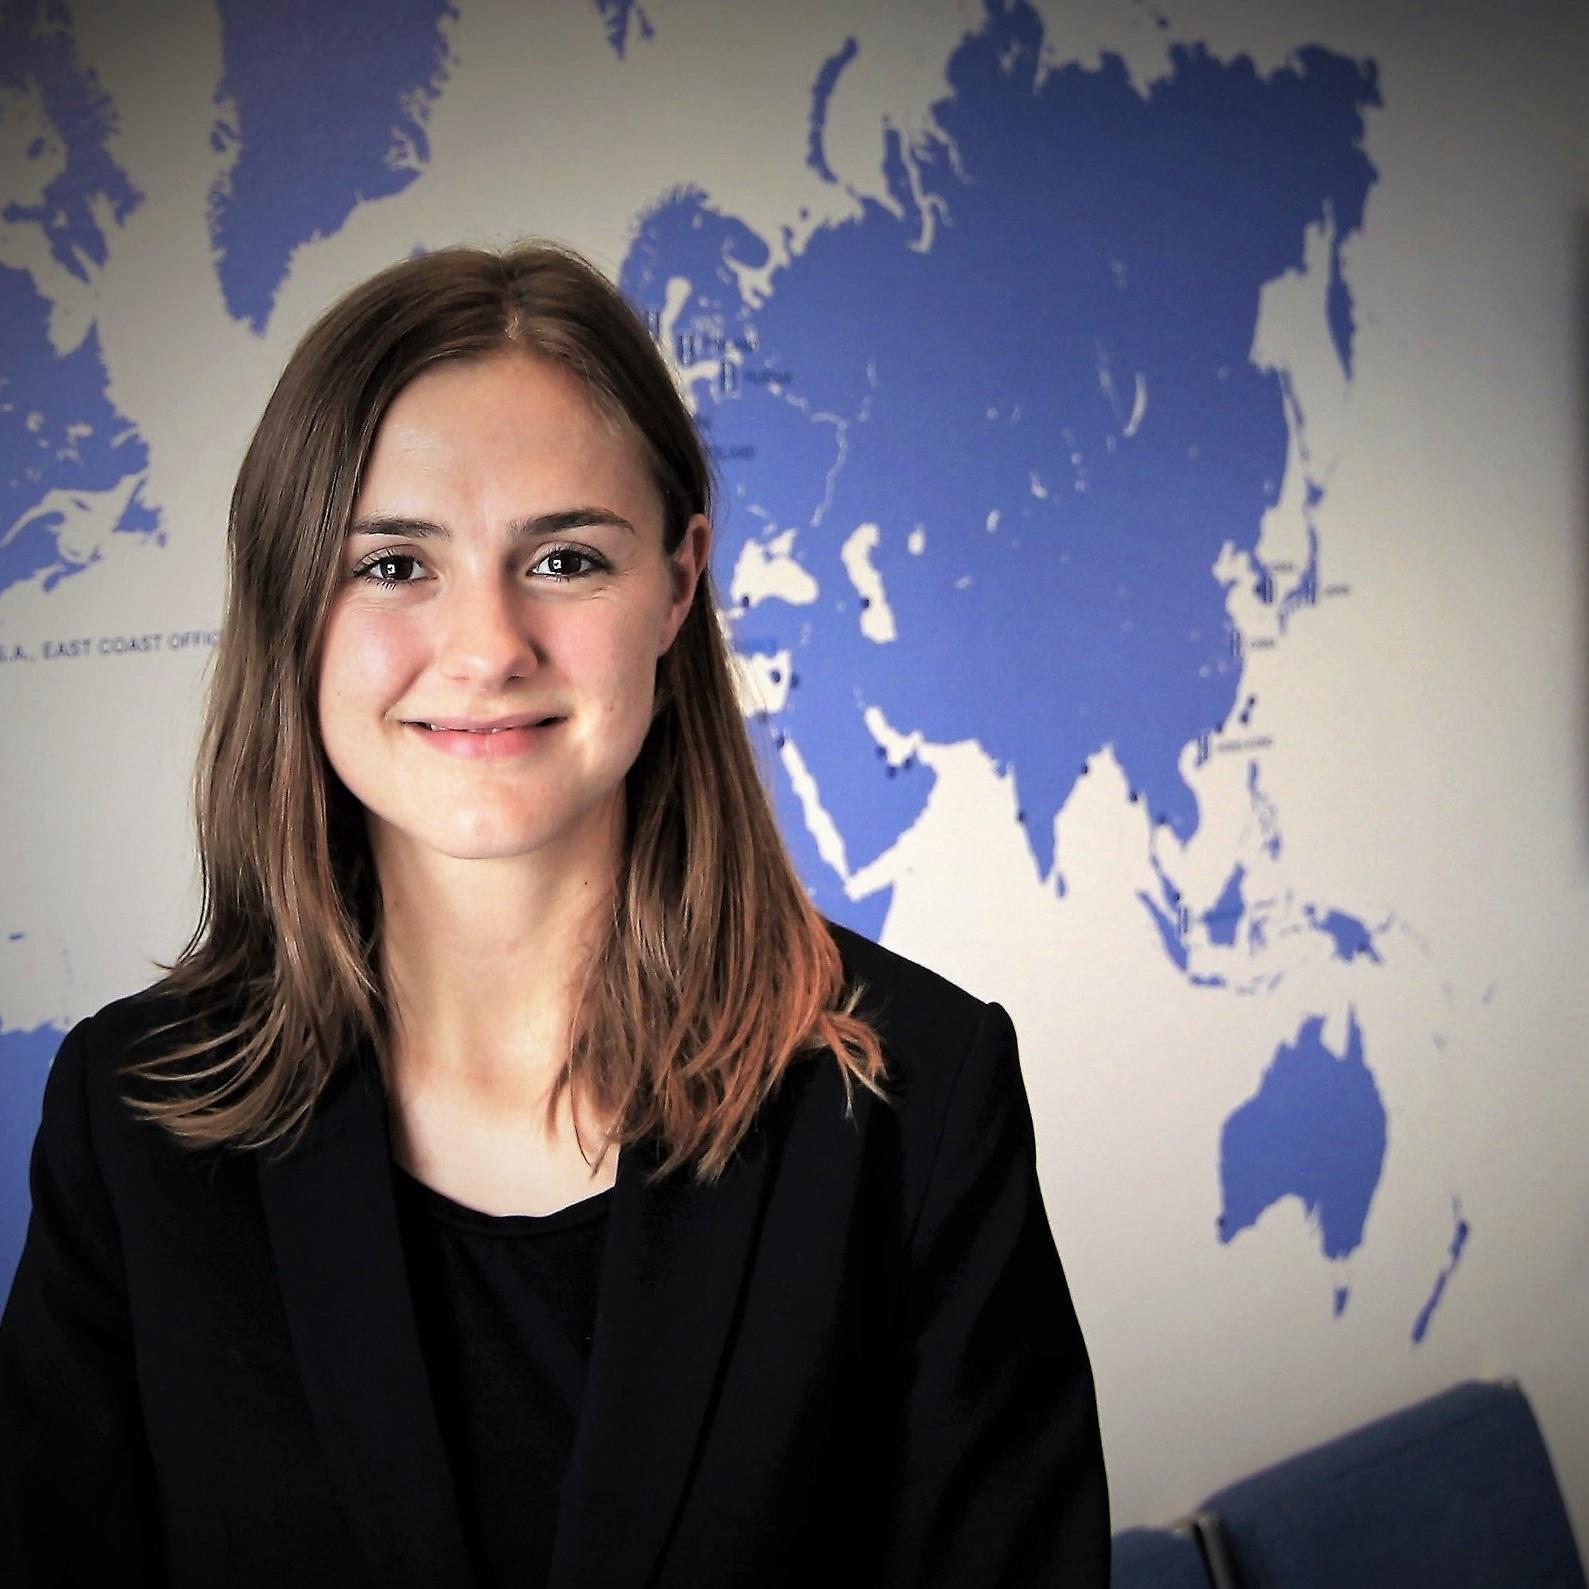 Julie Seindal Thorhauge Marketing and Communication Manager - JST@furuno.dk